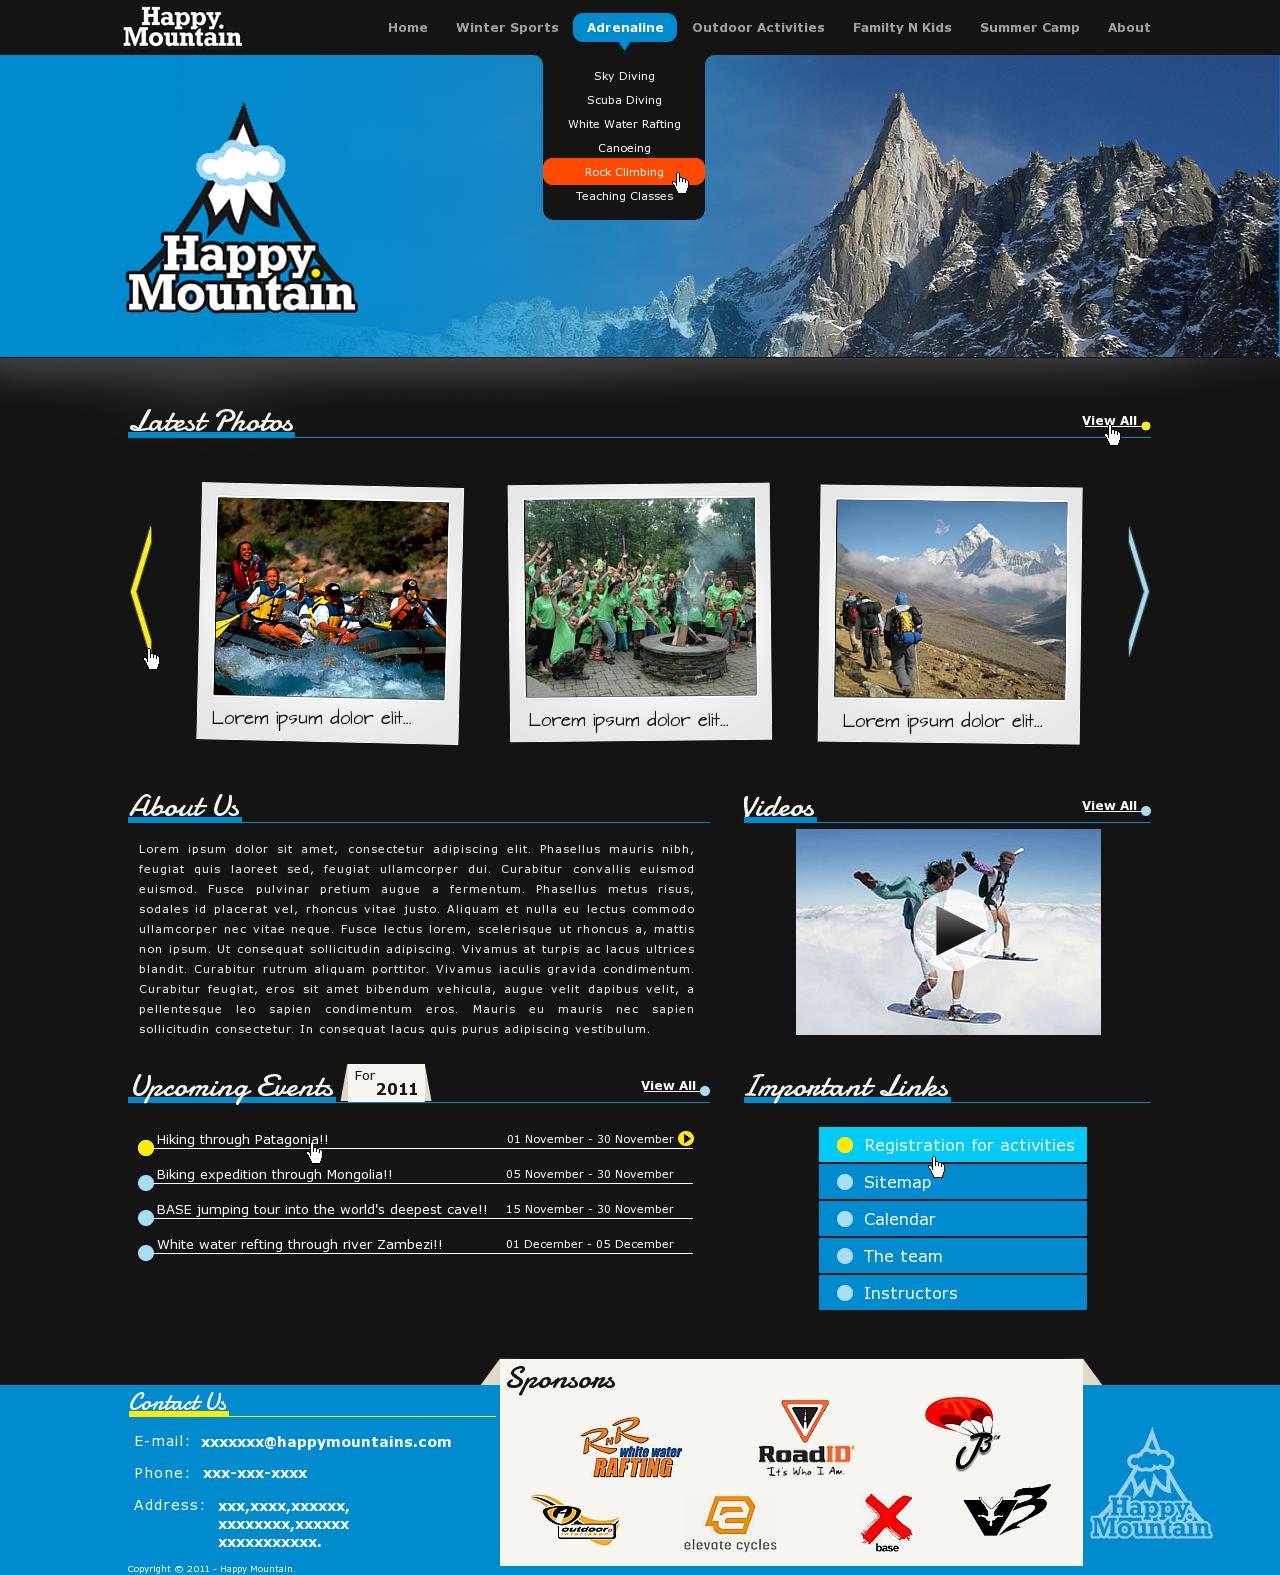 Happy Mountain needs a new website design